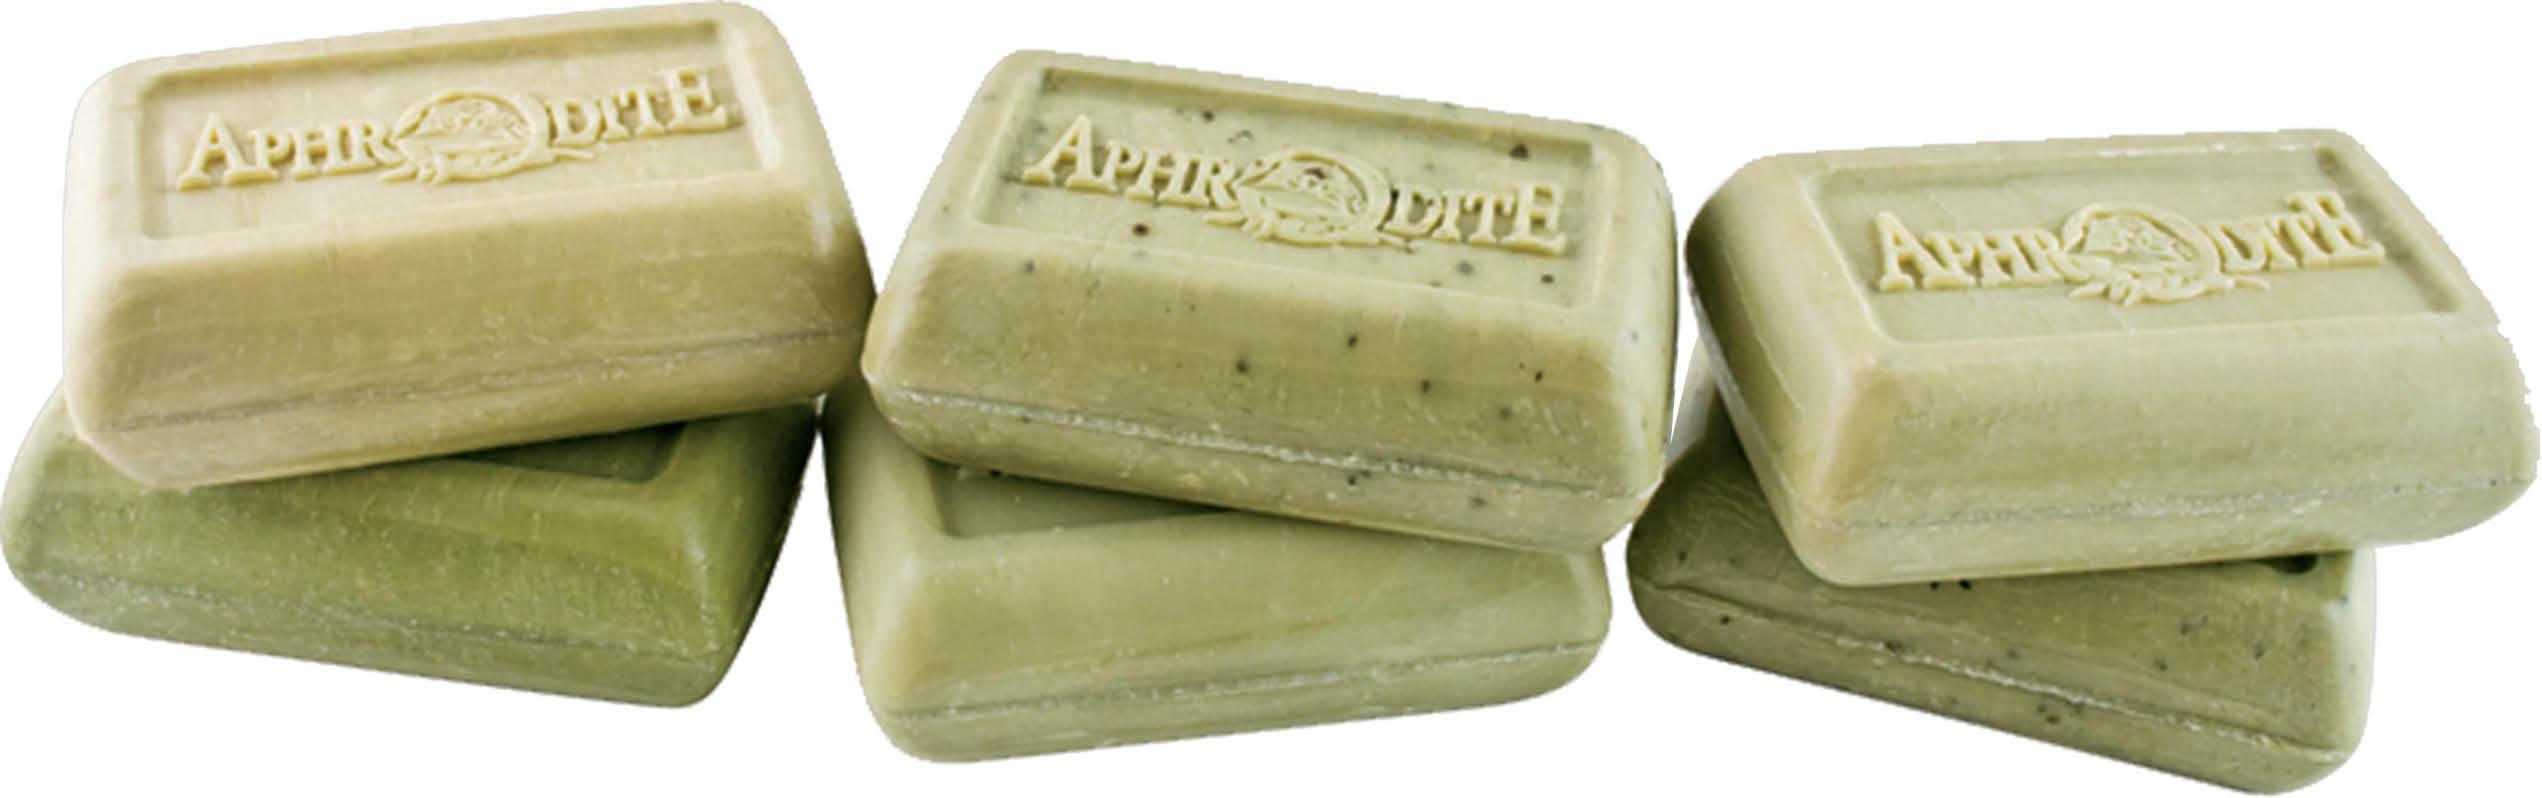 organic soap natural soap local soap cruelty free soap support local